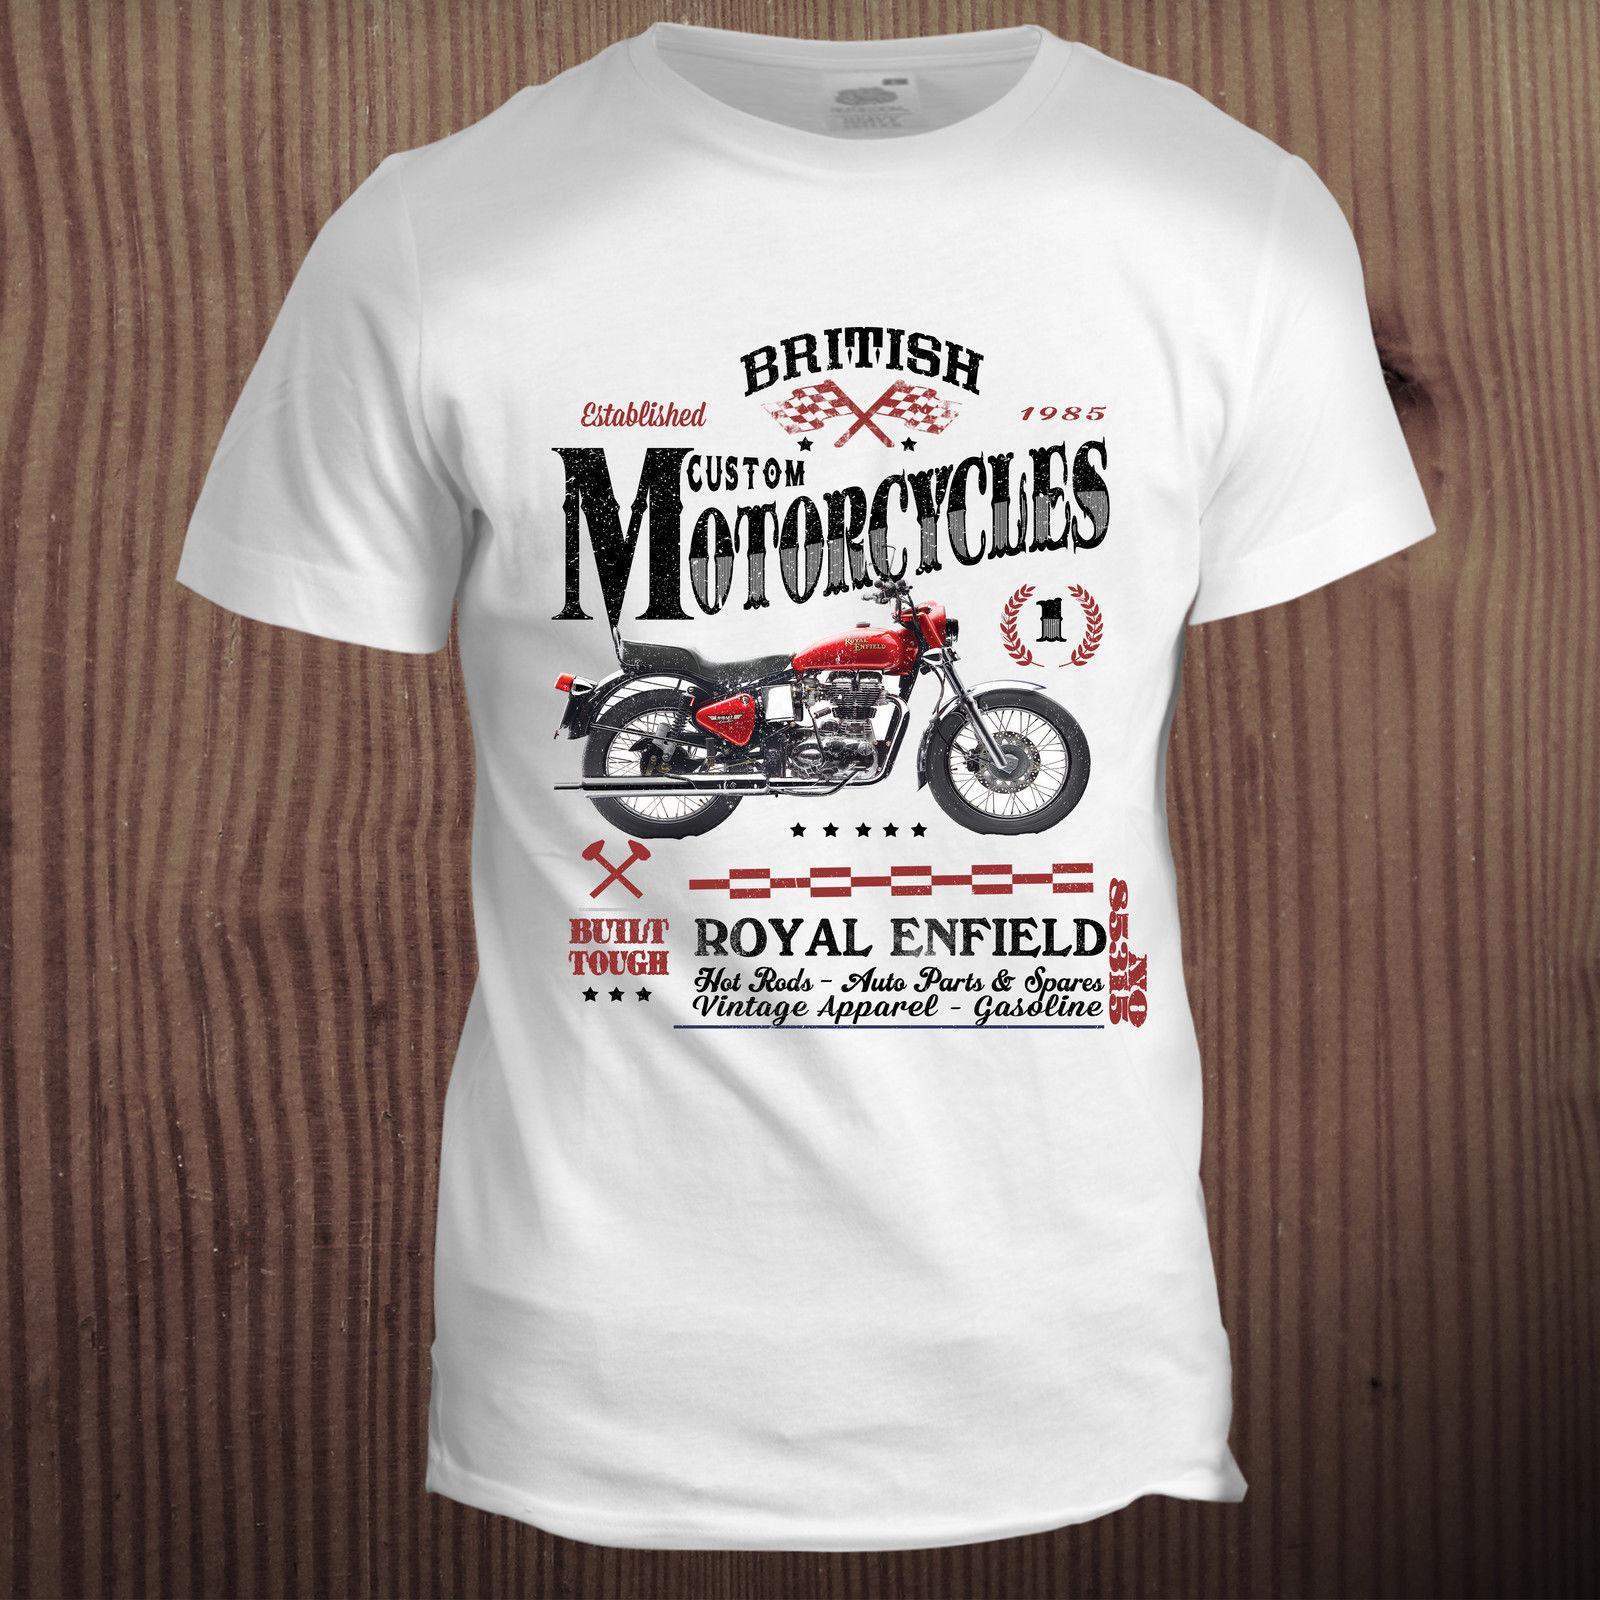 d53ab44f79b Motorbike Cafe Racer Sports Bike Biker Racing Motorcycle Skull T Shirt  Custom Printed Tshirt Hip Hop Funny Tee Shirt Design Mens Shirt From  Hermestshirt